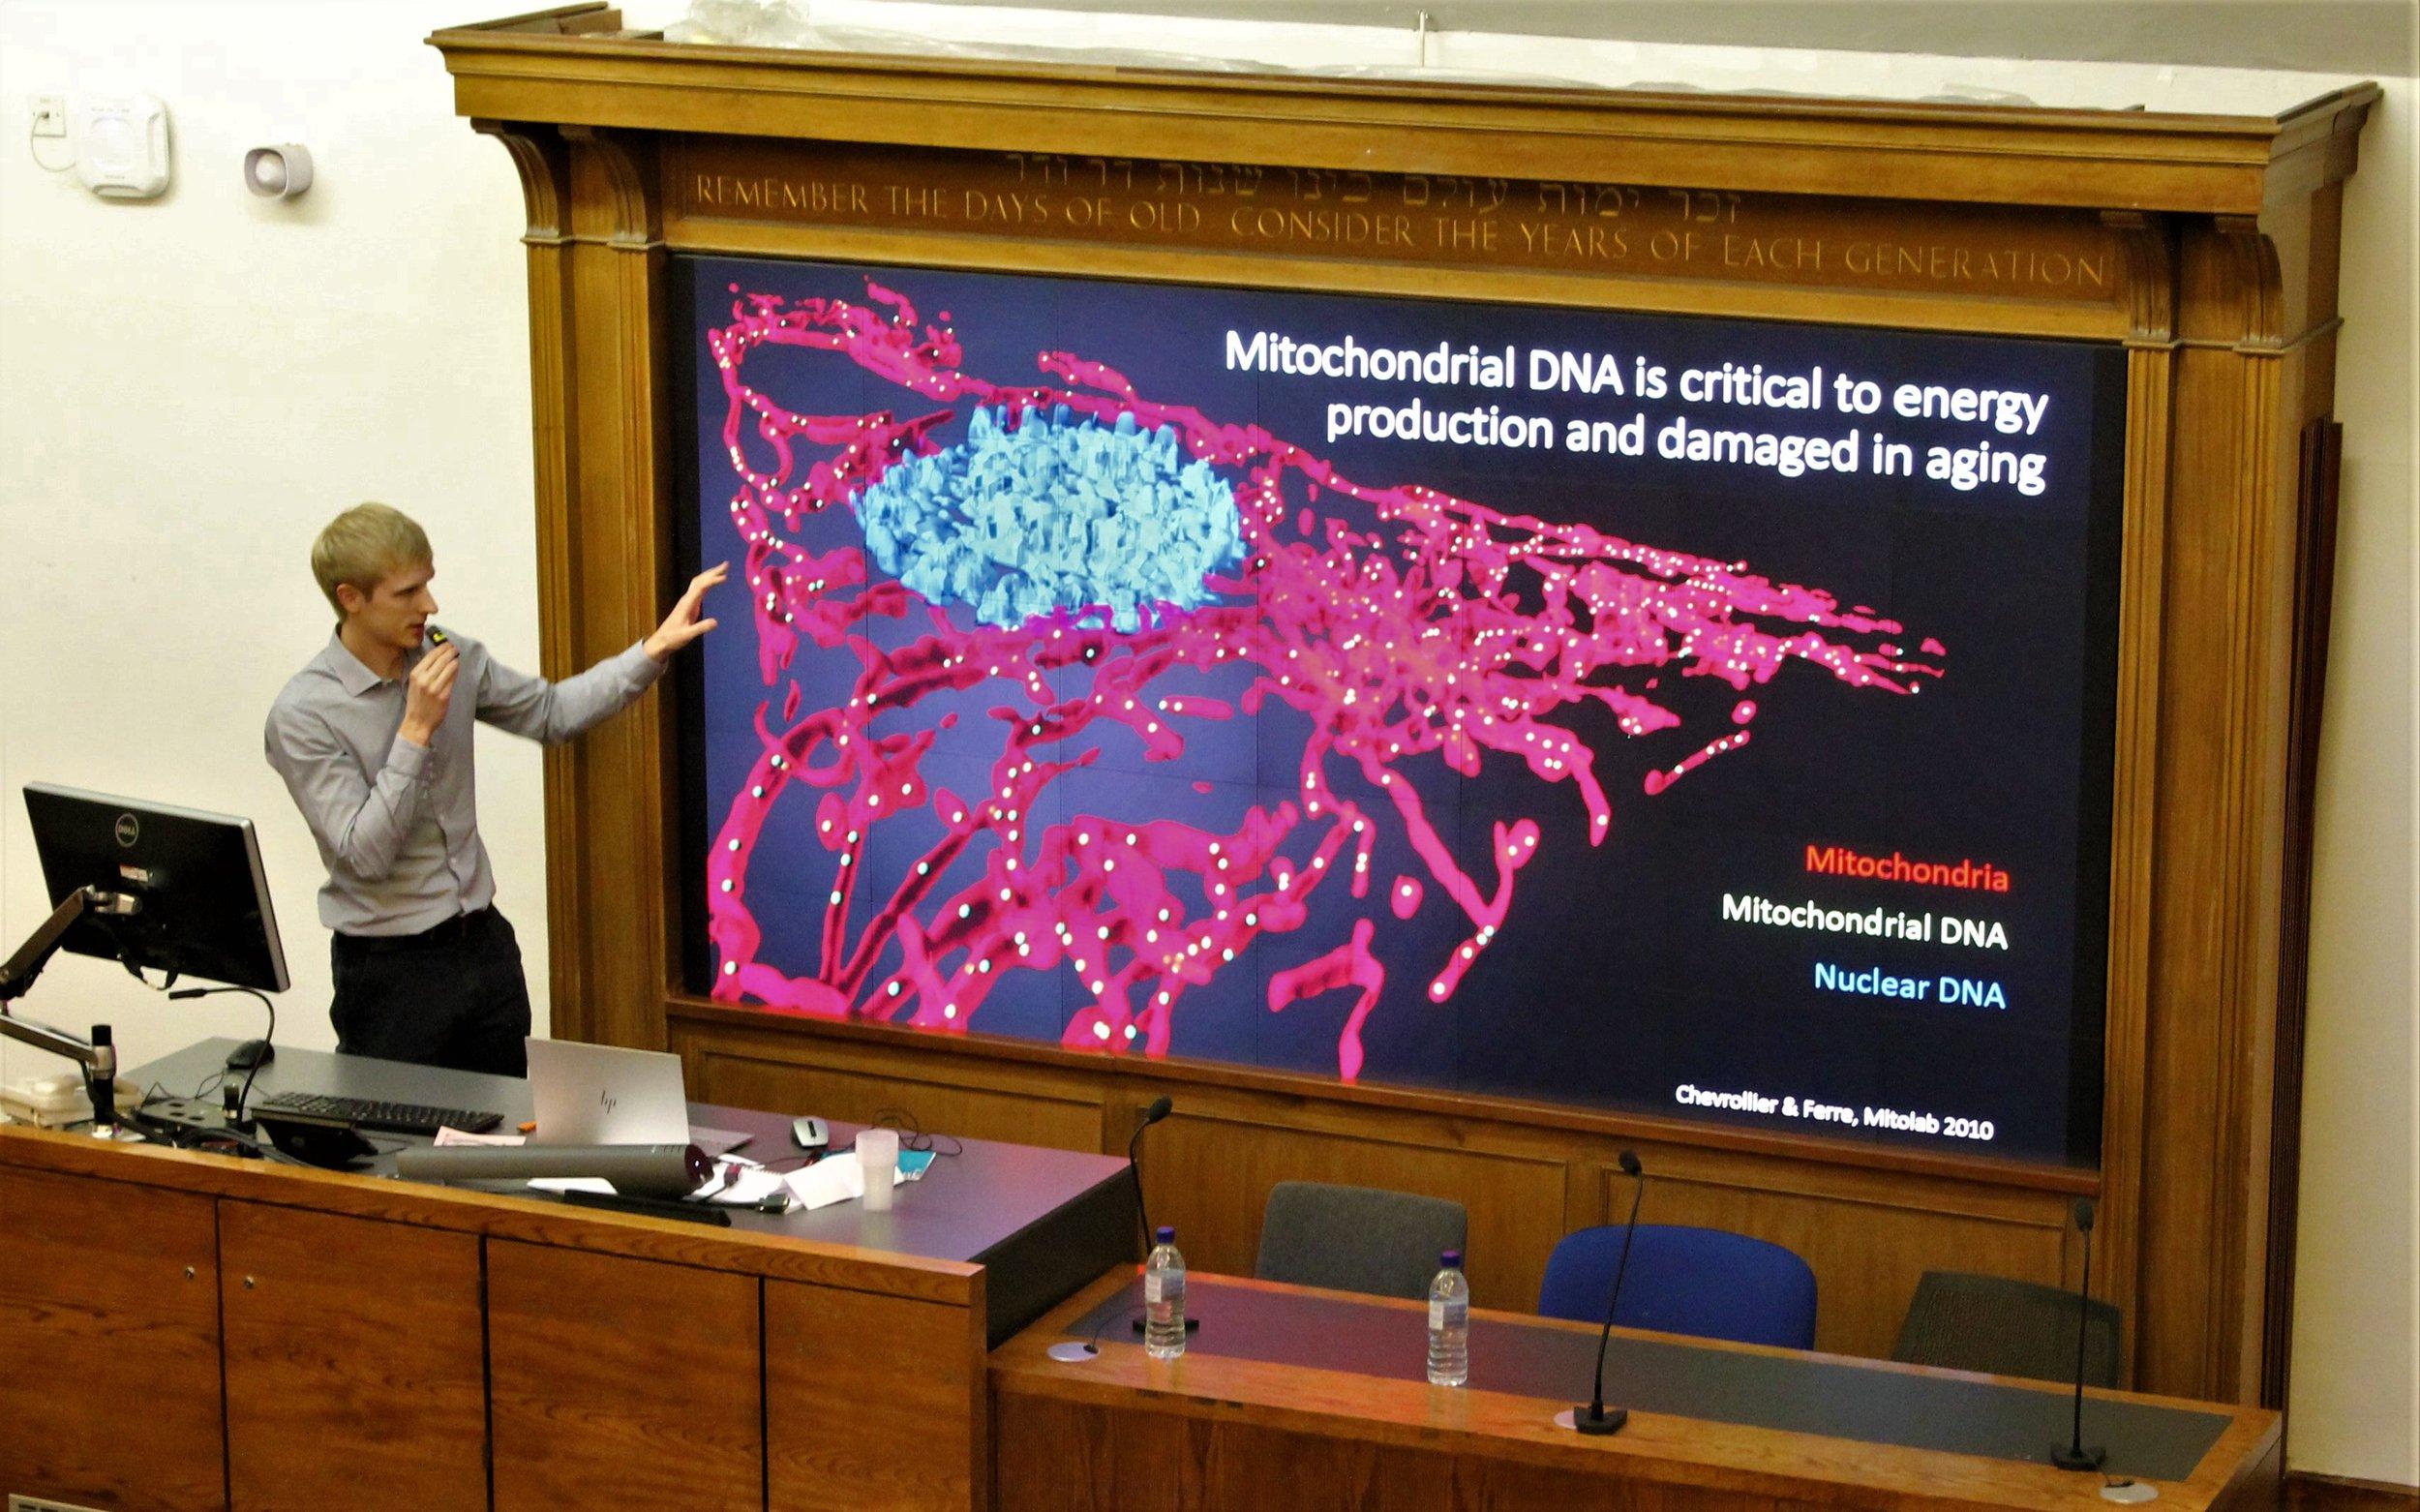 Dr Daniel Ives- Shift Bioscience